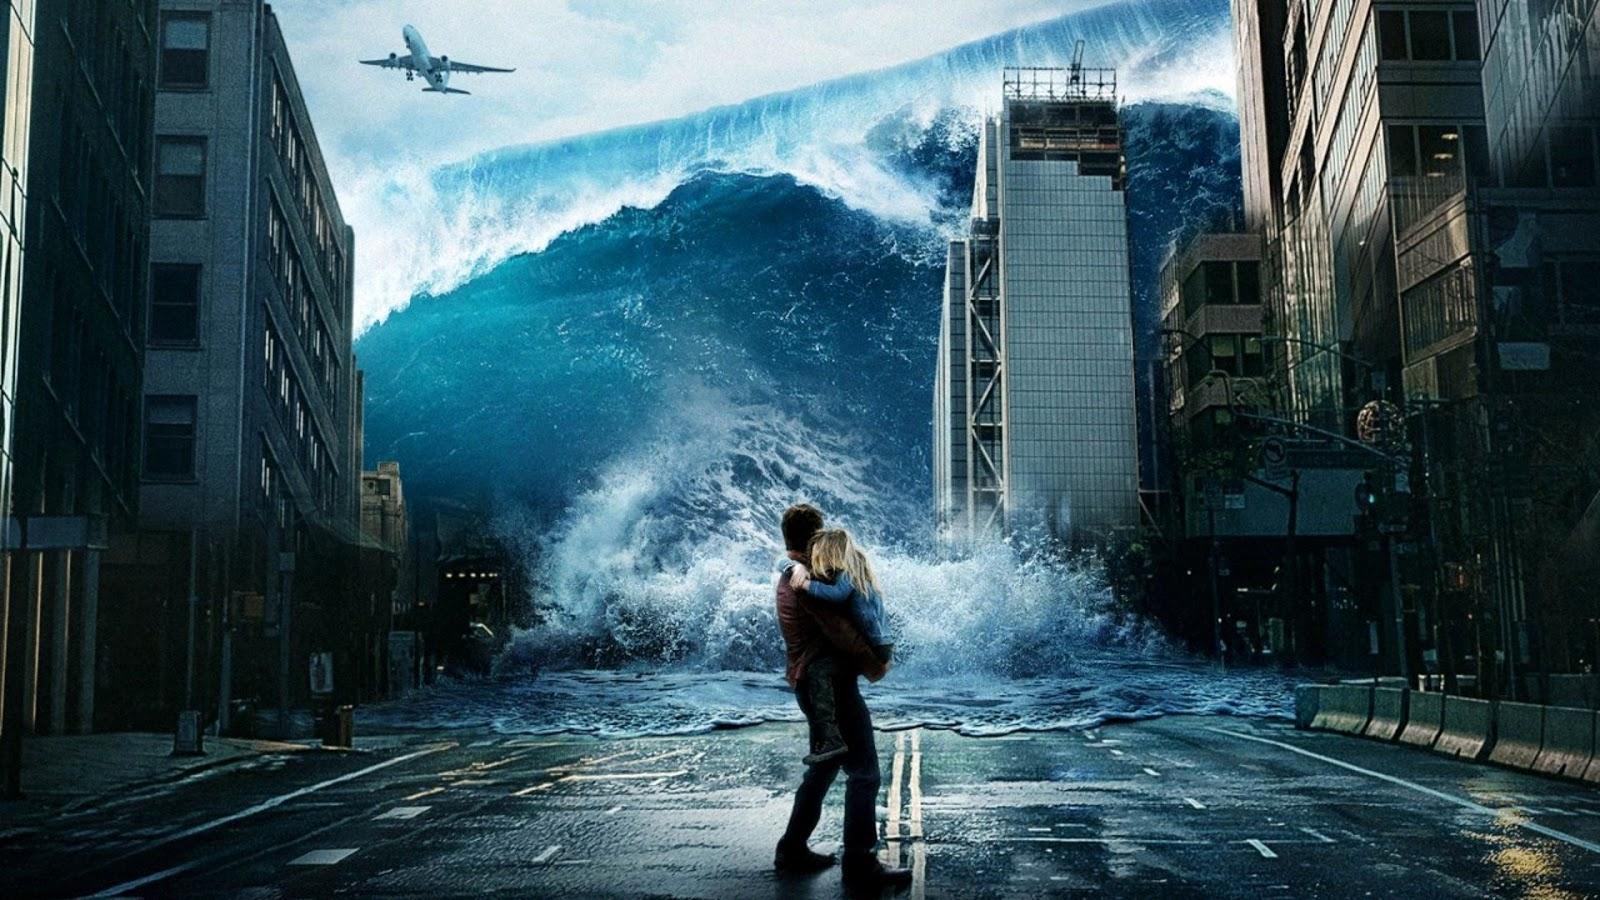 Film Geostorm 2017 Radarhijau